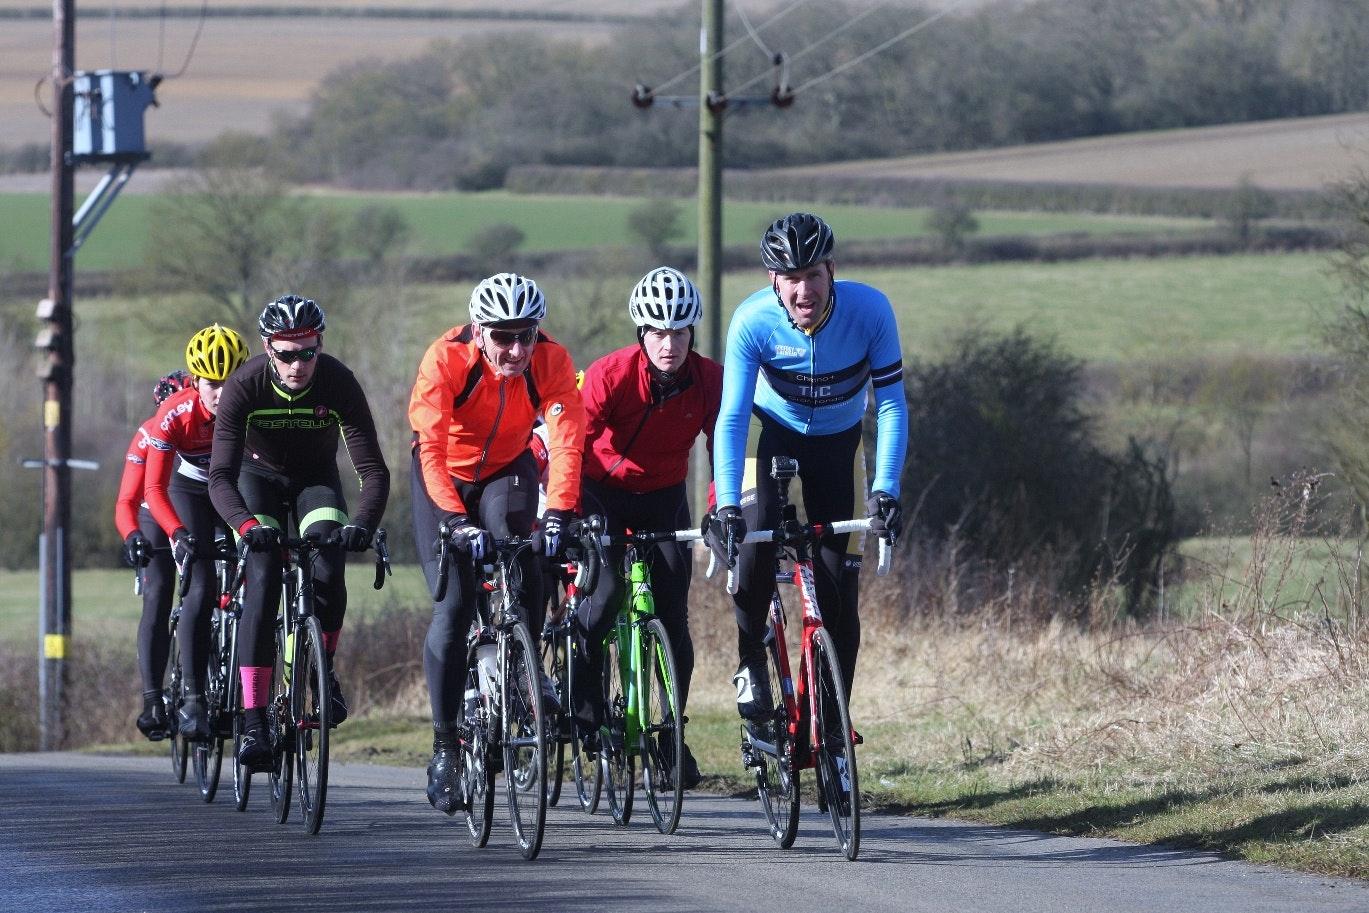 Tour of Cambridgeshire, Gran Fondo, sportive, pic: Tour of Cambrideshire